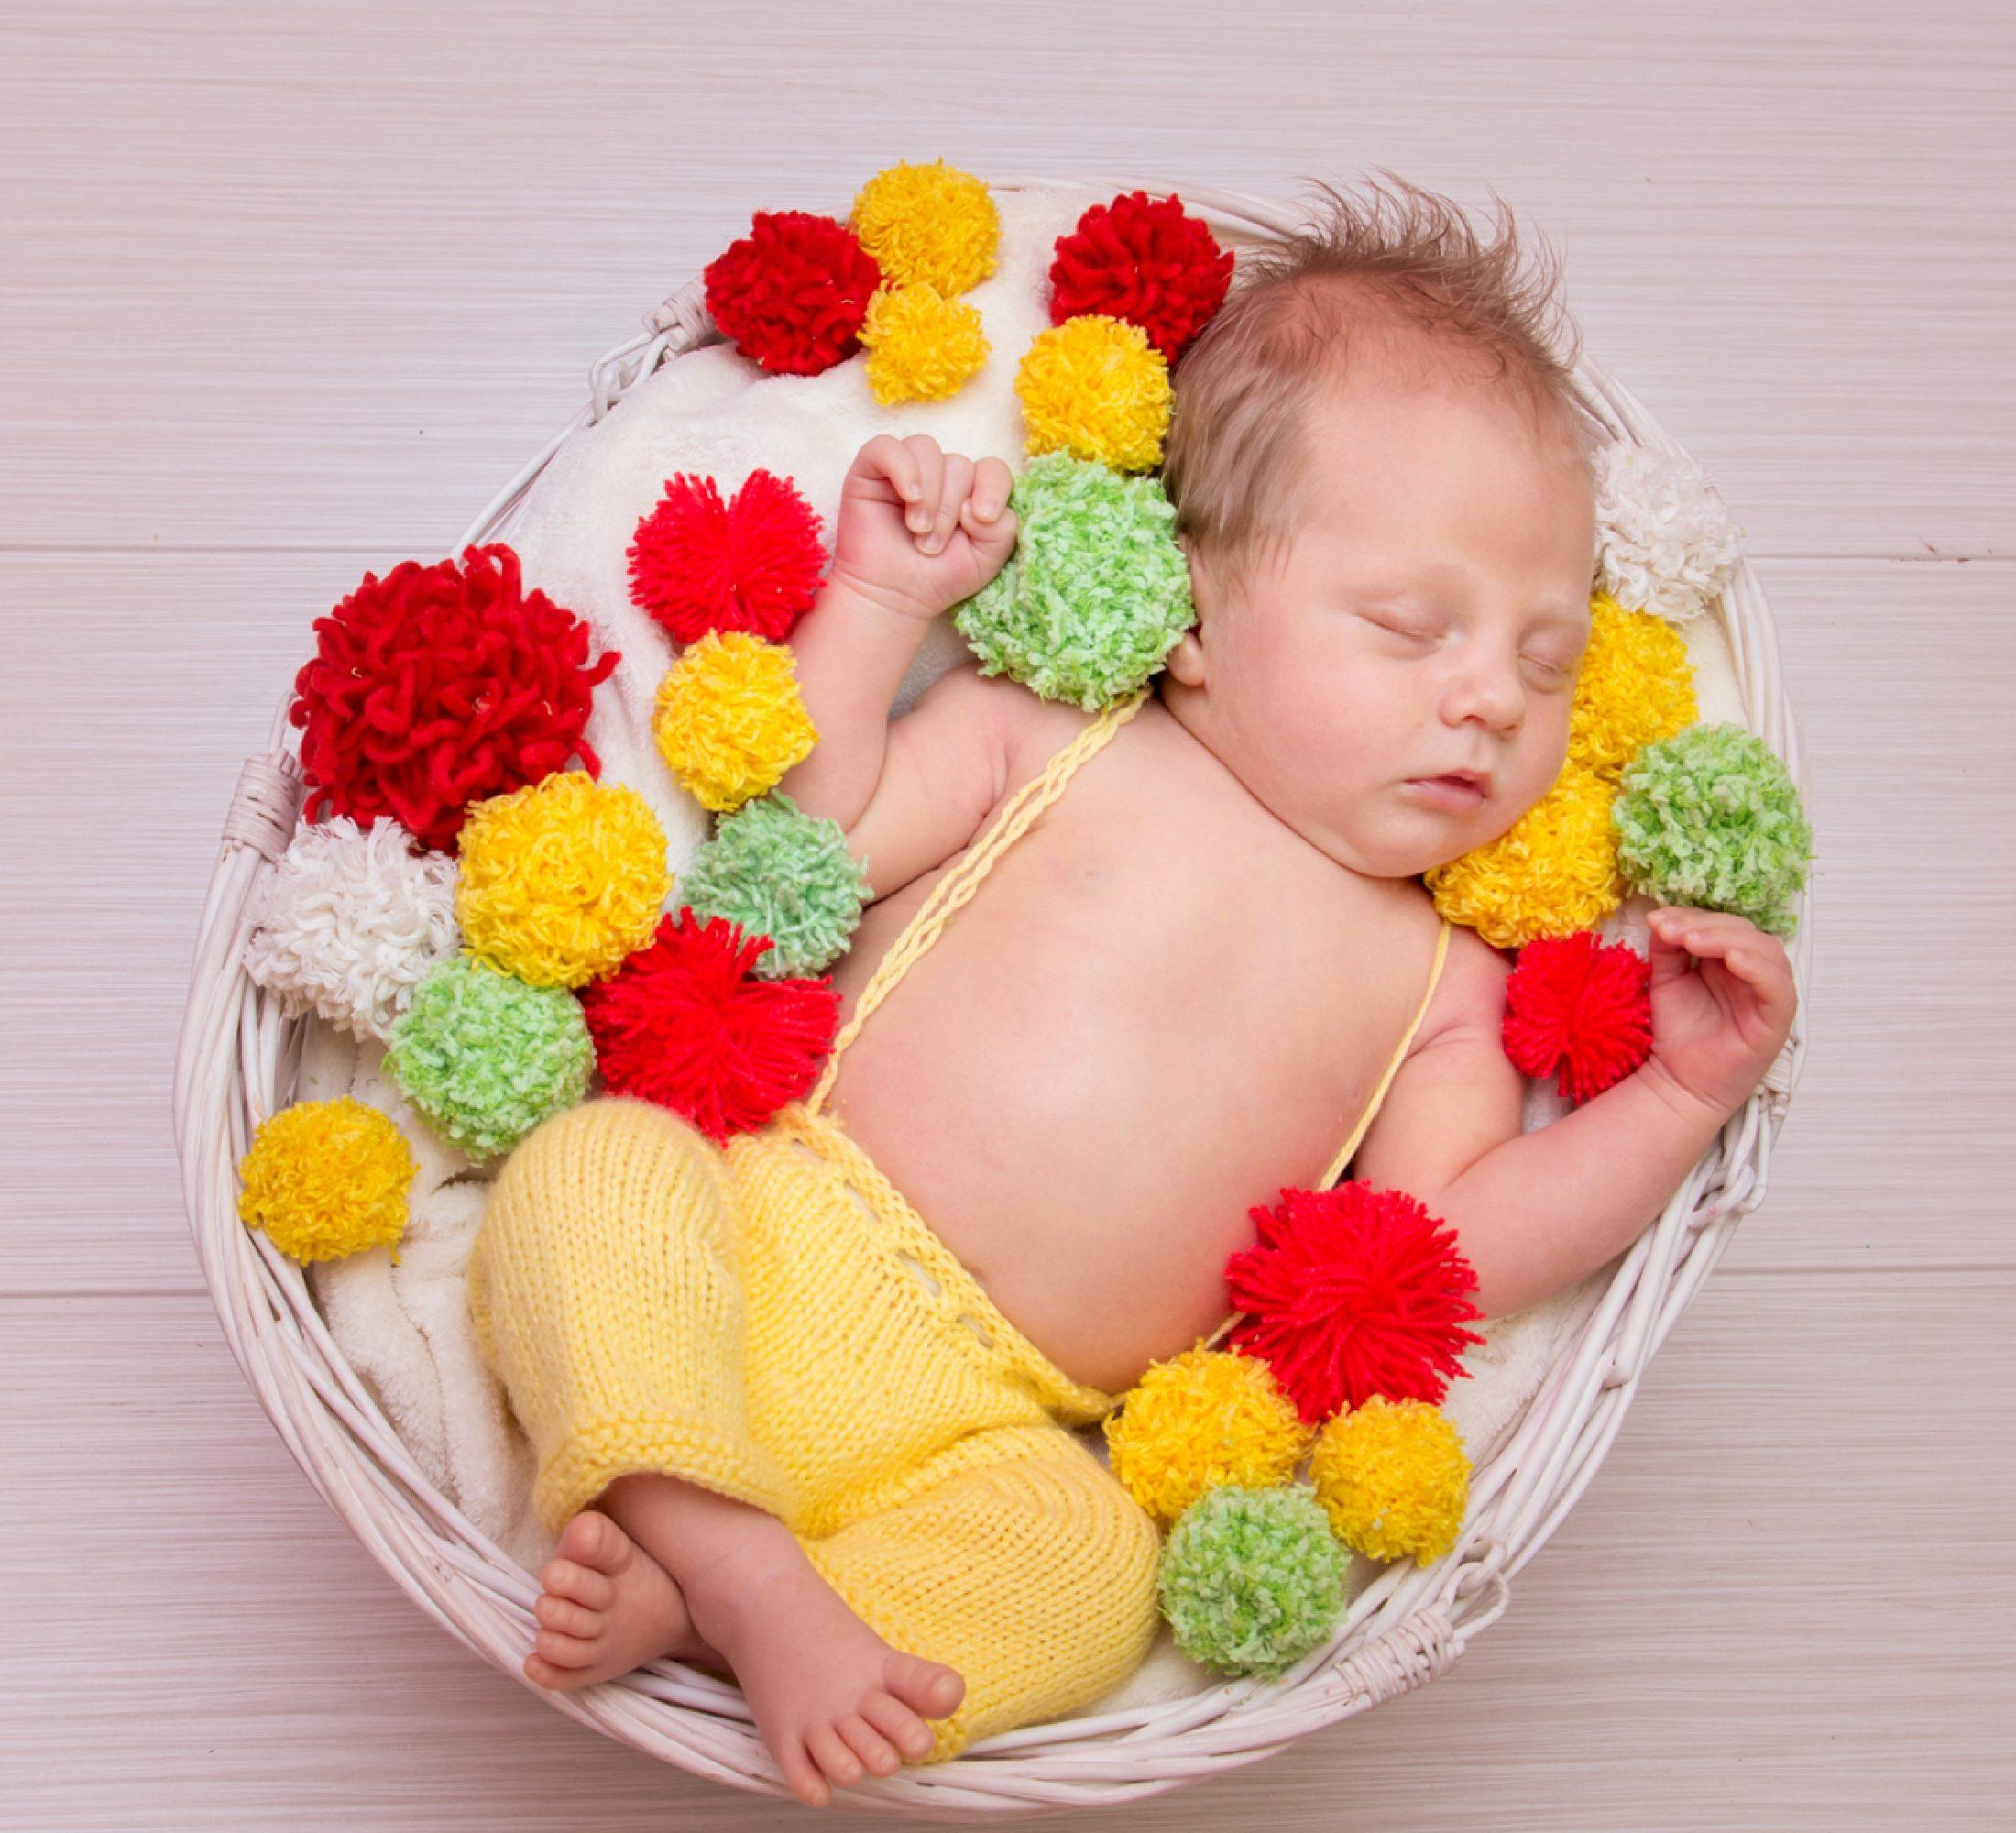 fotografie-de-nou-nascut